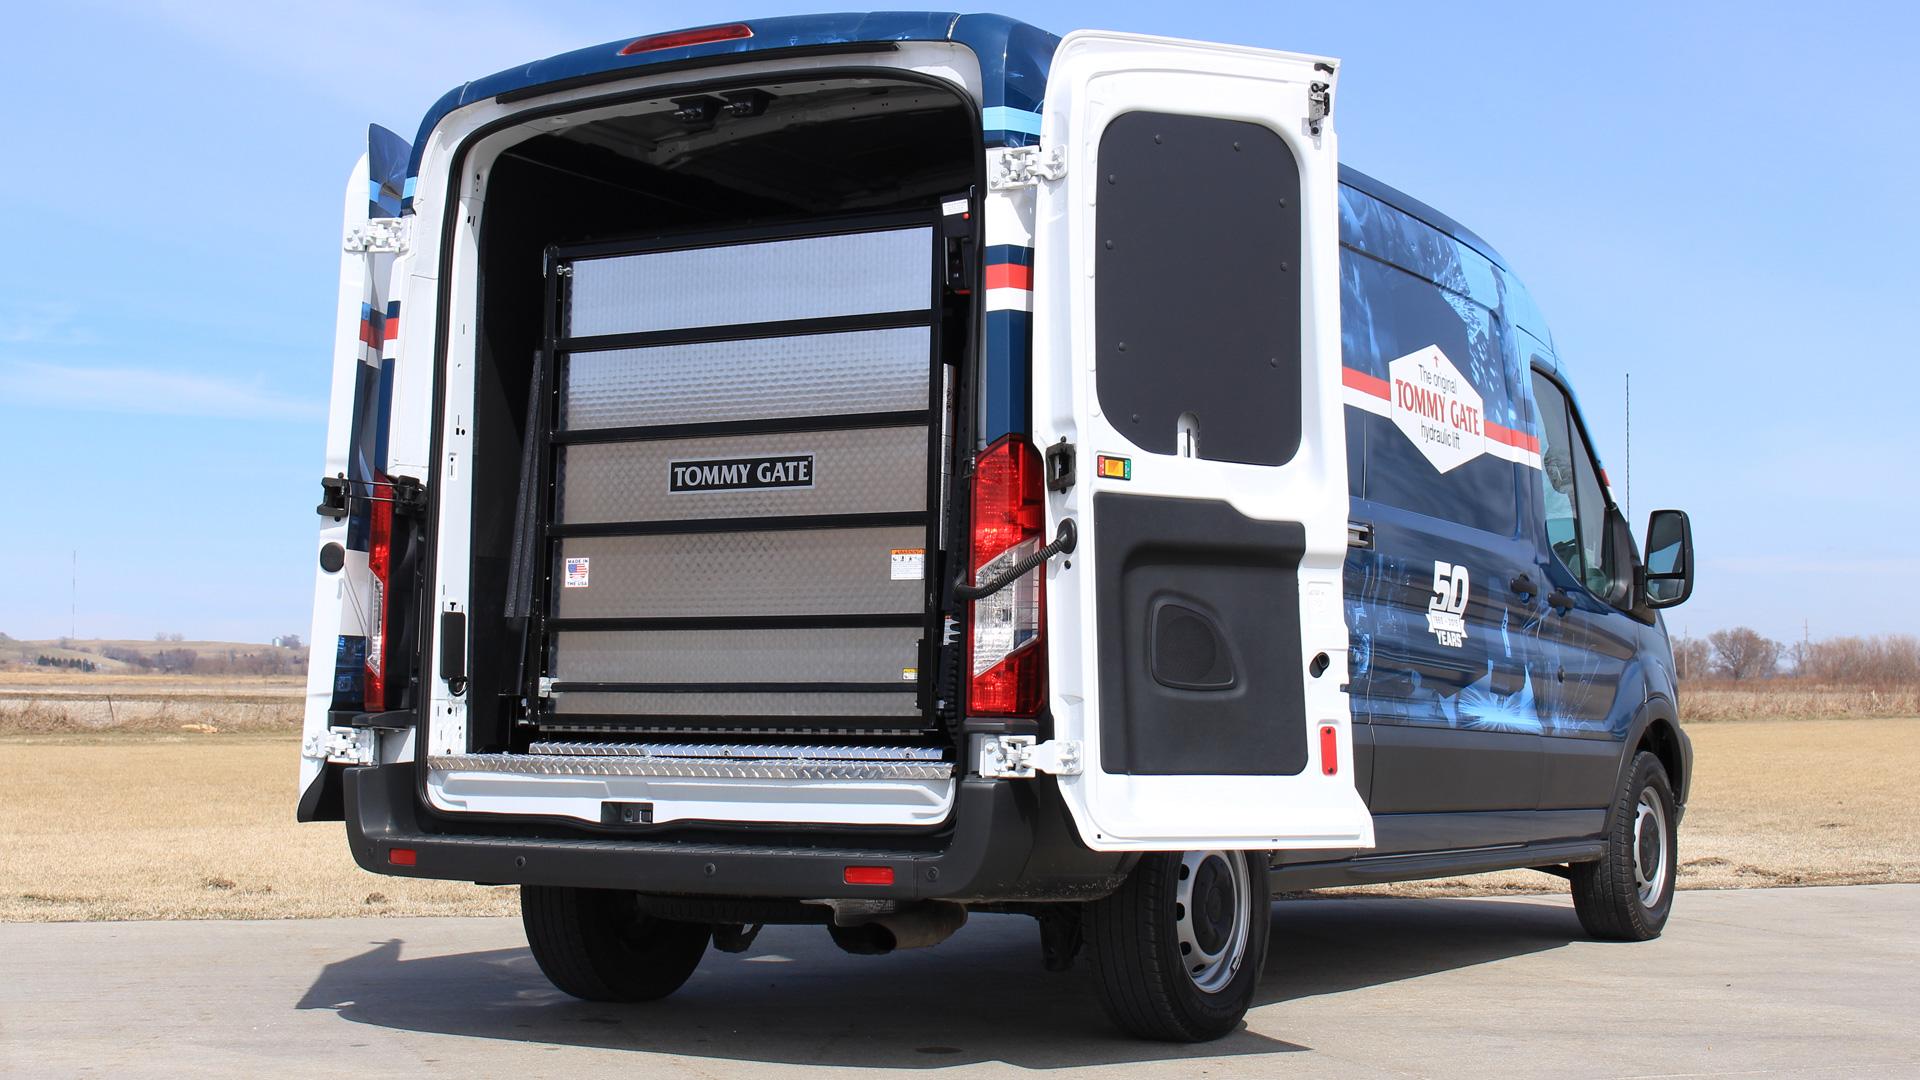 Ford Transit 250 >> Tommy Gate - V2 Series